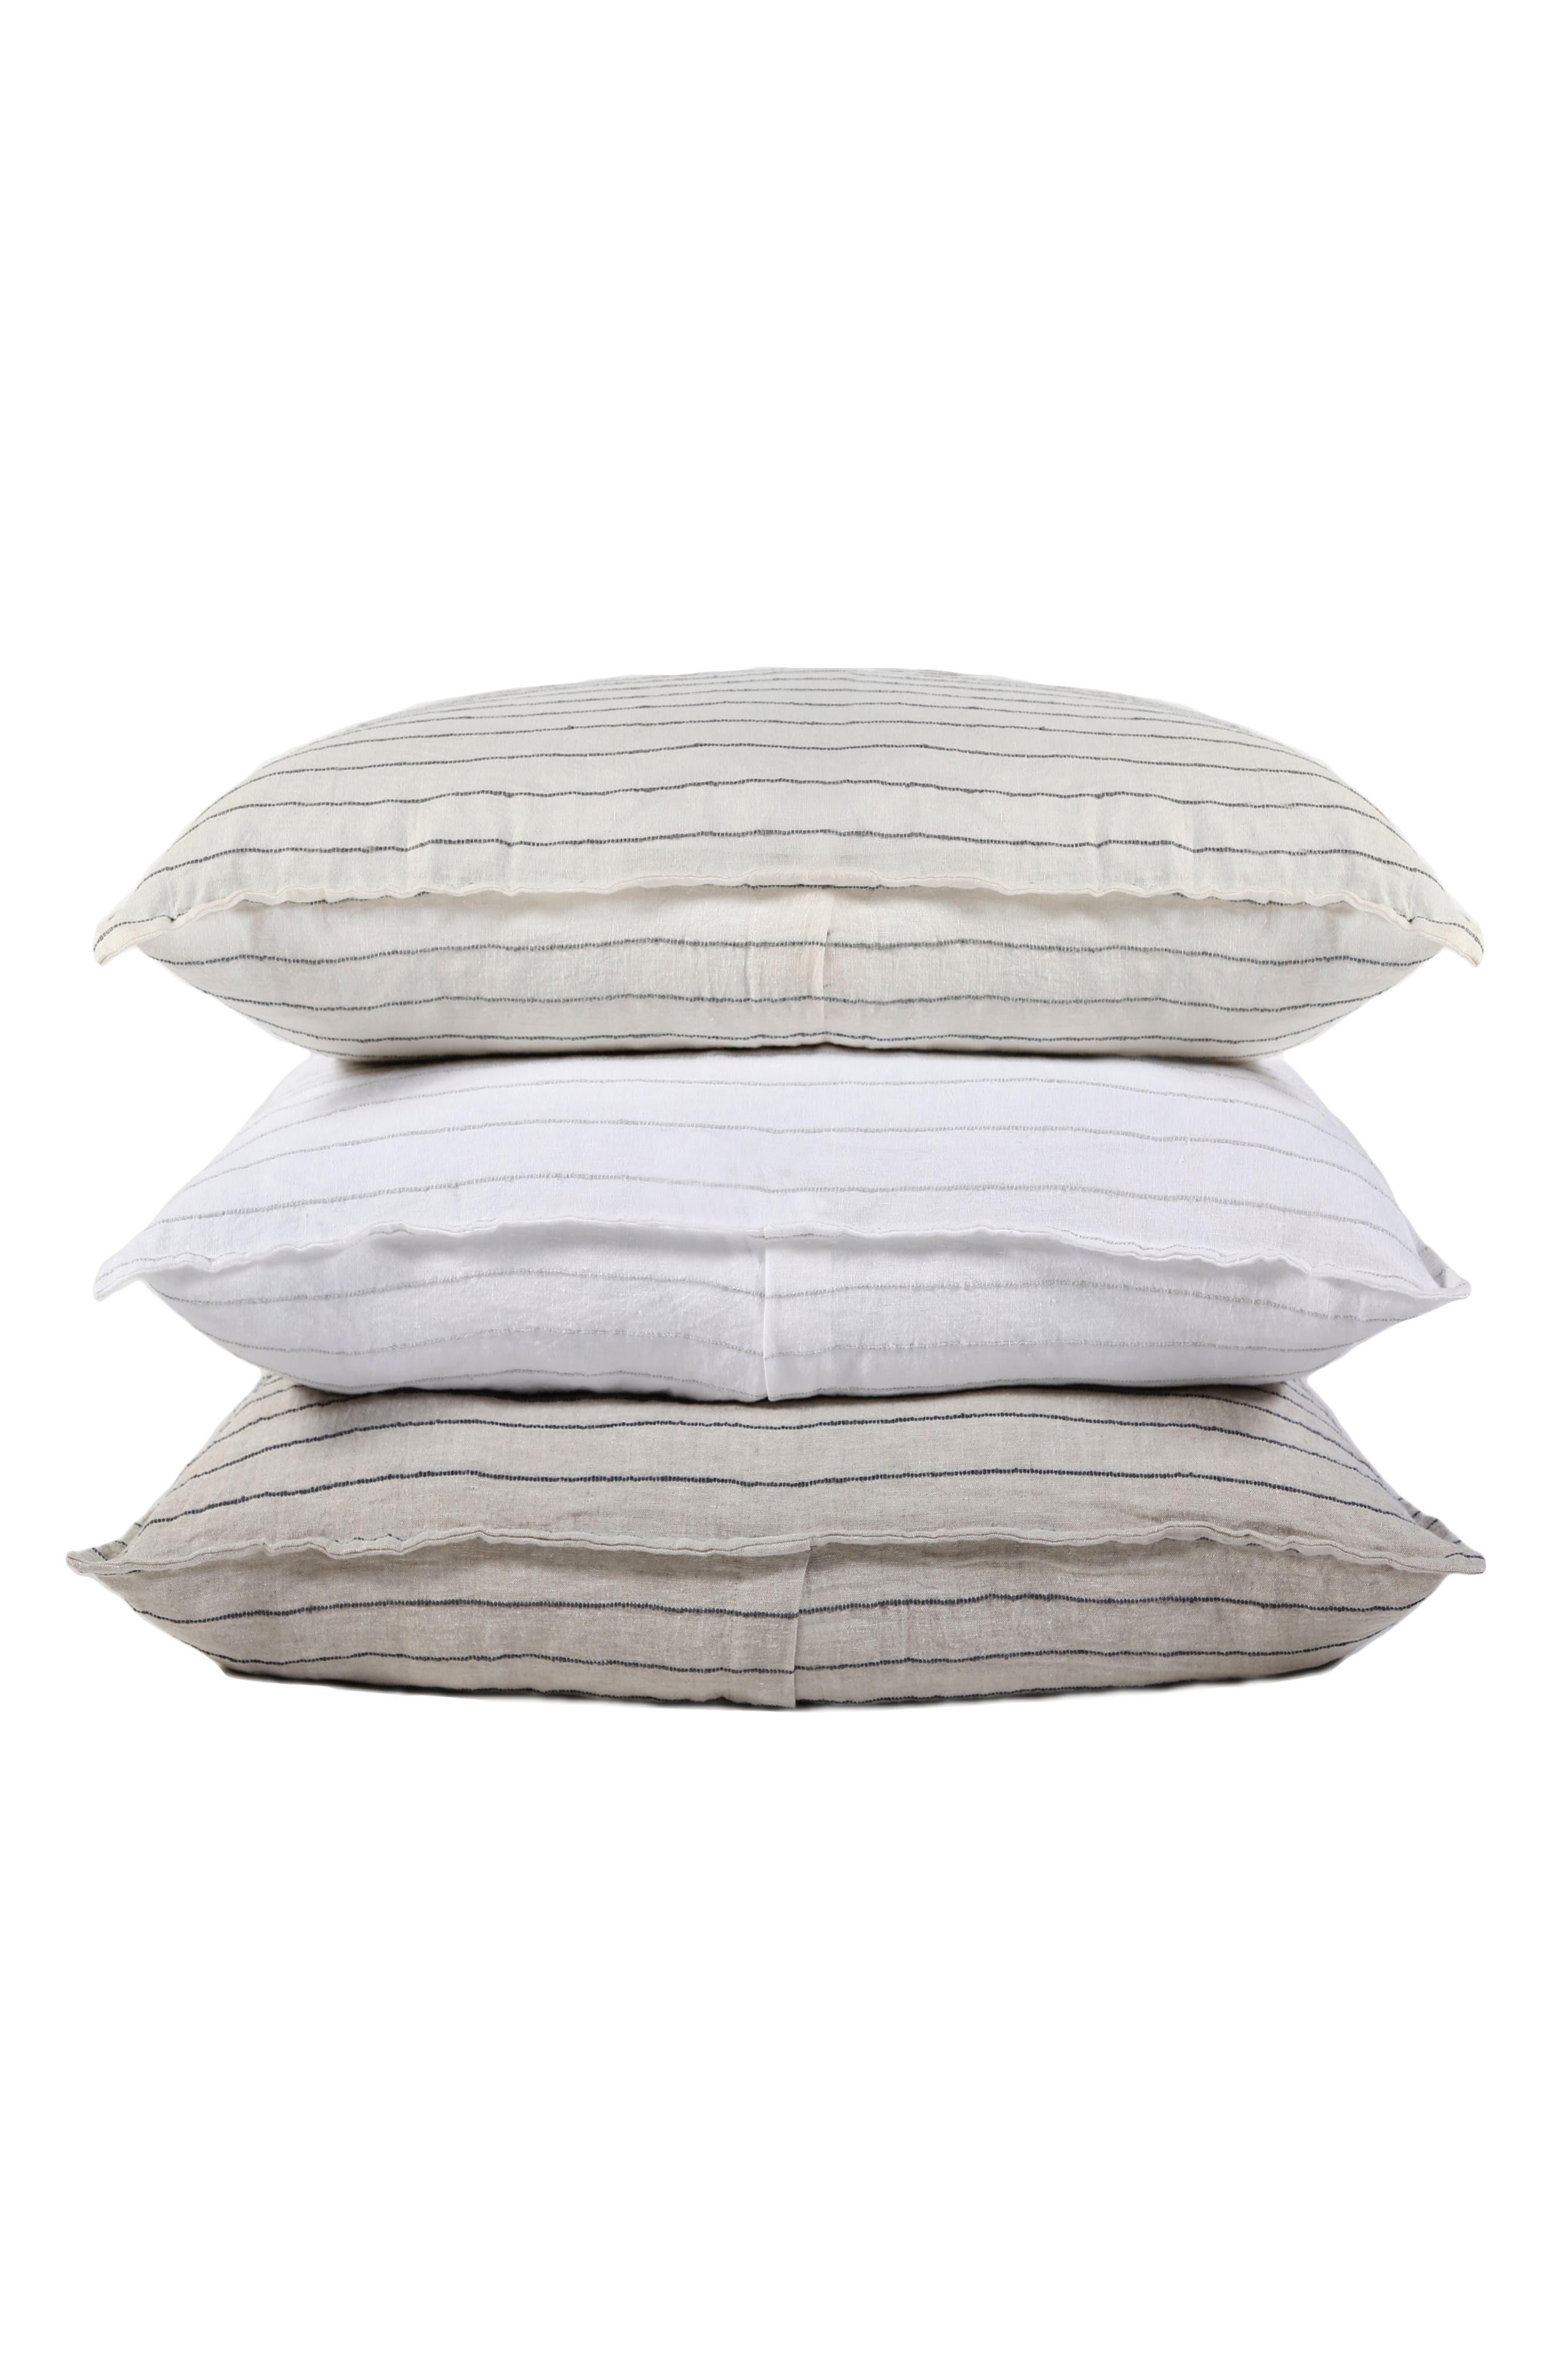 POM POM AT HOME, Blake Big Linen Accent Pillow, Alternate thumbnail 3, color, WHITE/ OCEAN